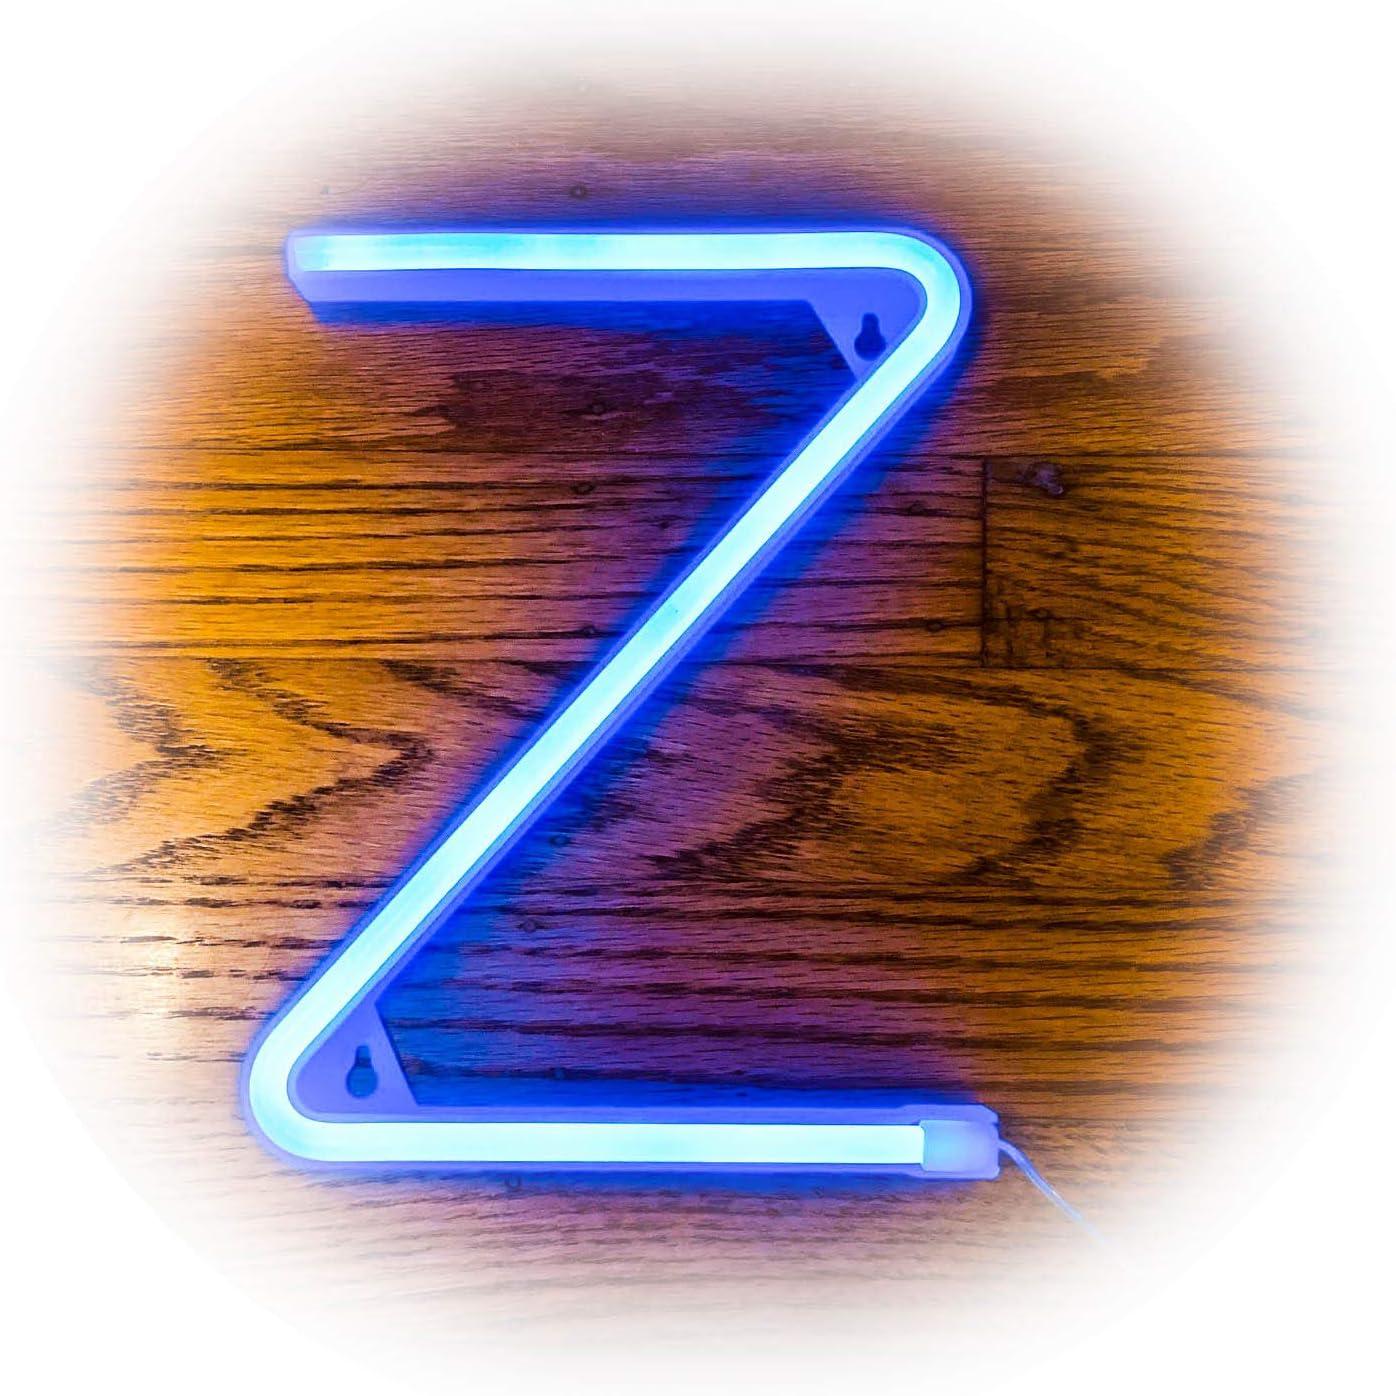 ZOLED Blue Neon Signs, LED Letter, Neon Light, LED Sign, Letter Lights, Lighted Letters, Marquee Letter, Home Decor for Bar, Wall, Bedroom (Letter Z)